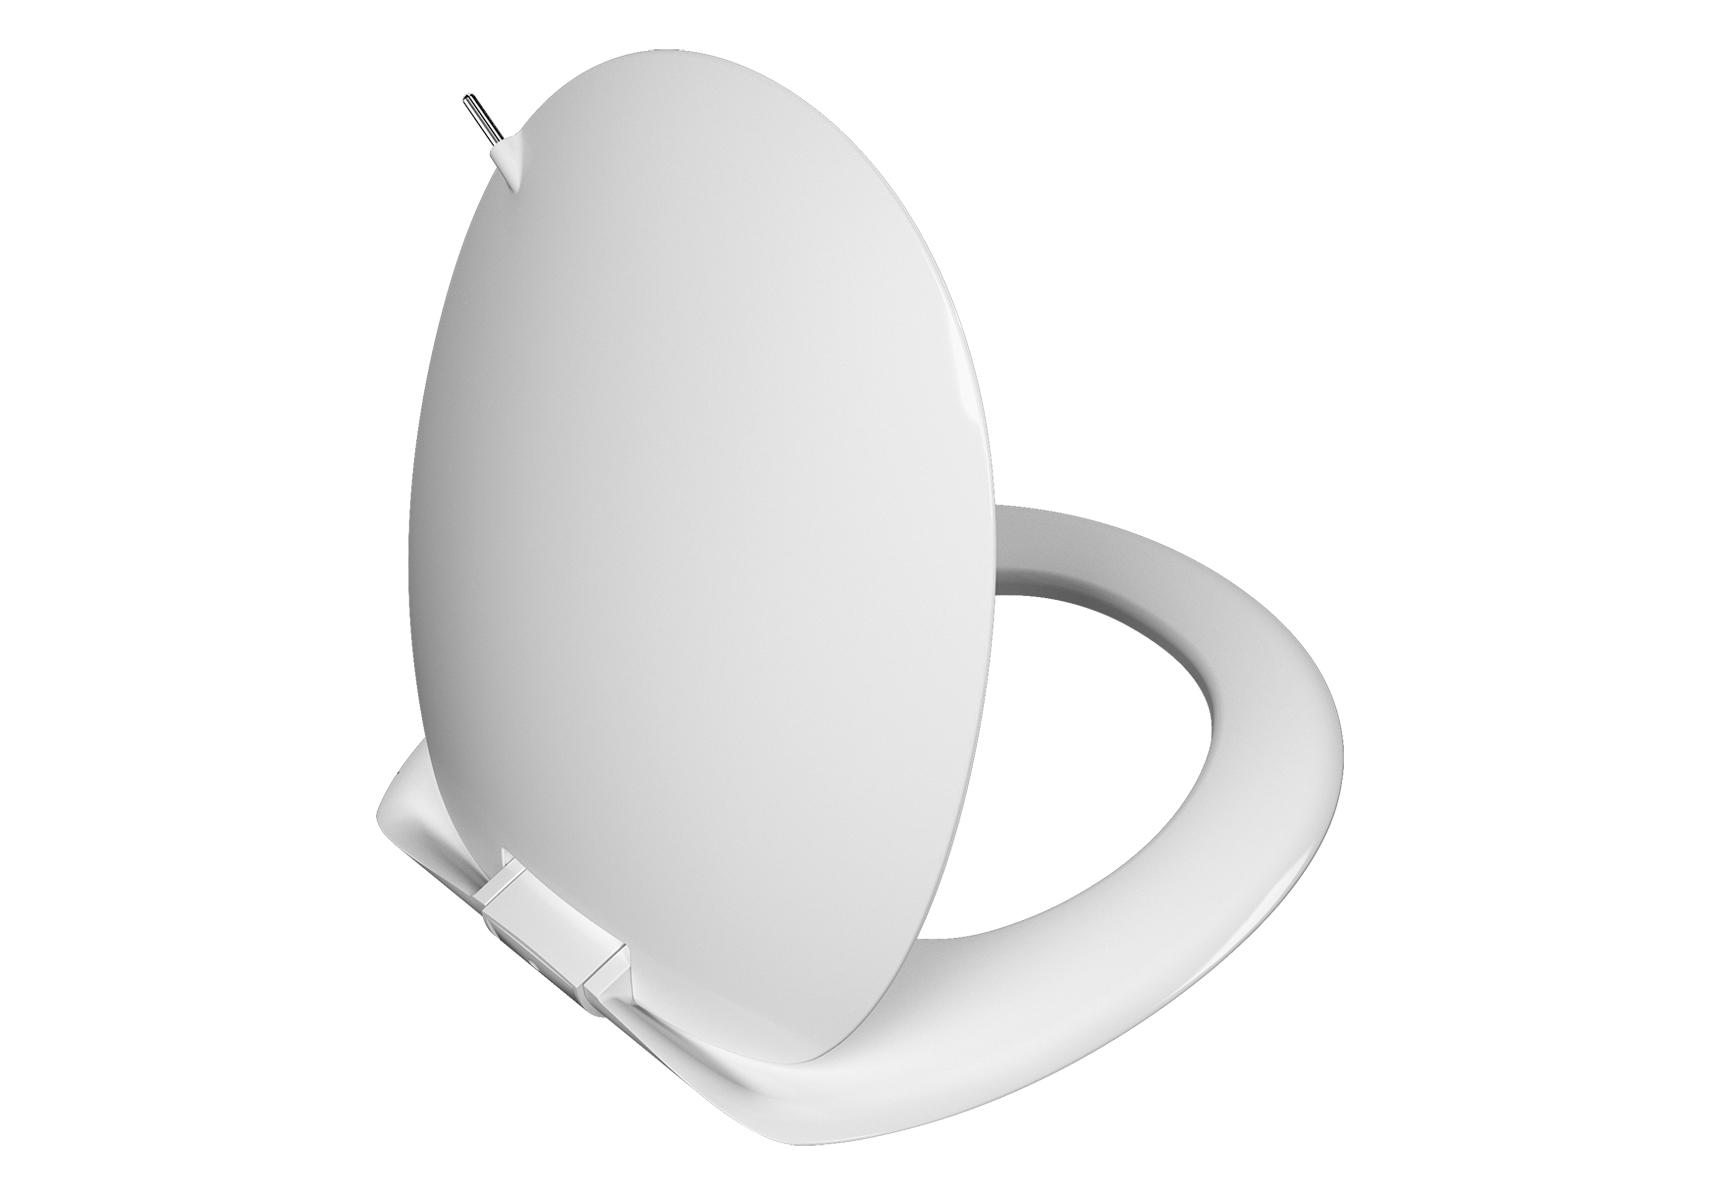 Istanbul WC-Sitz LED, mit Absenkautomatik, Weiß